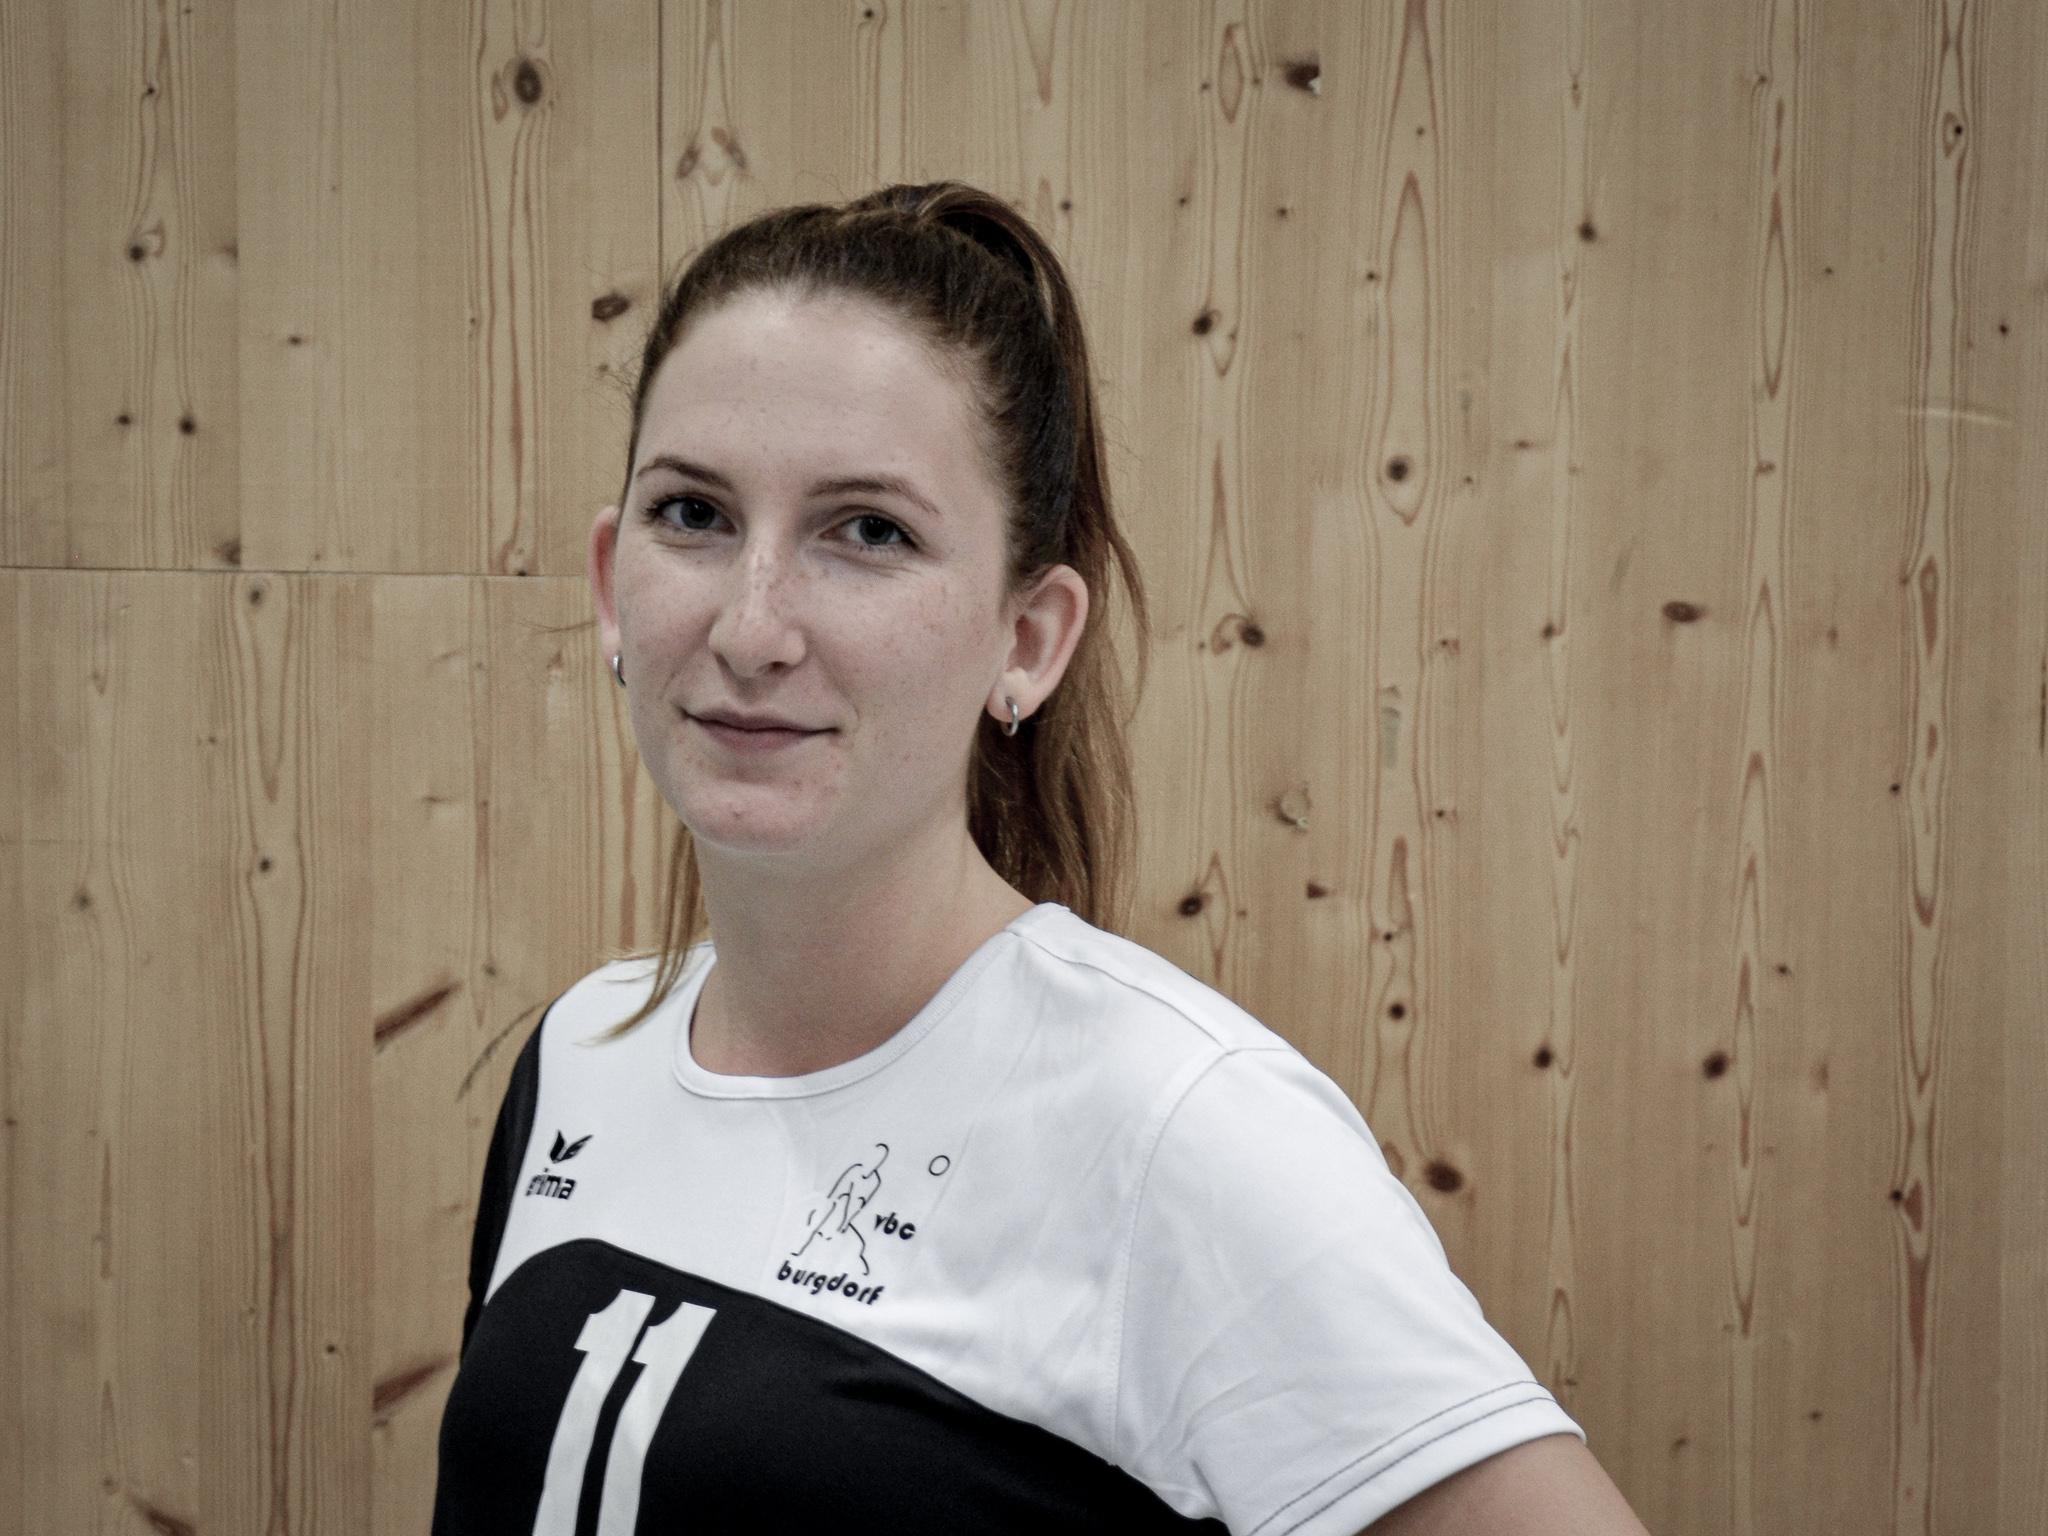 Dominique Welsch